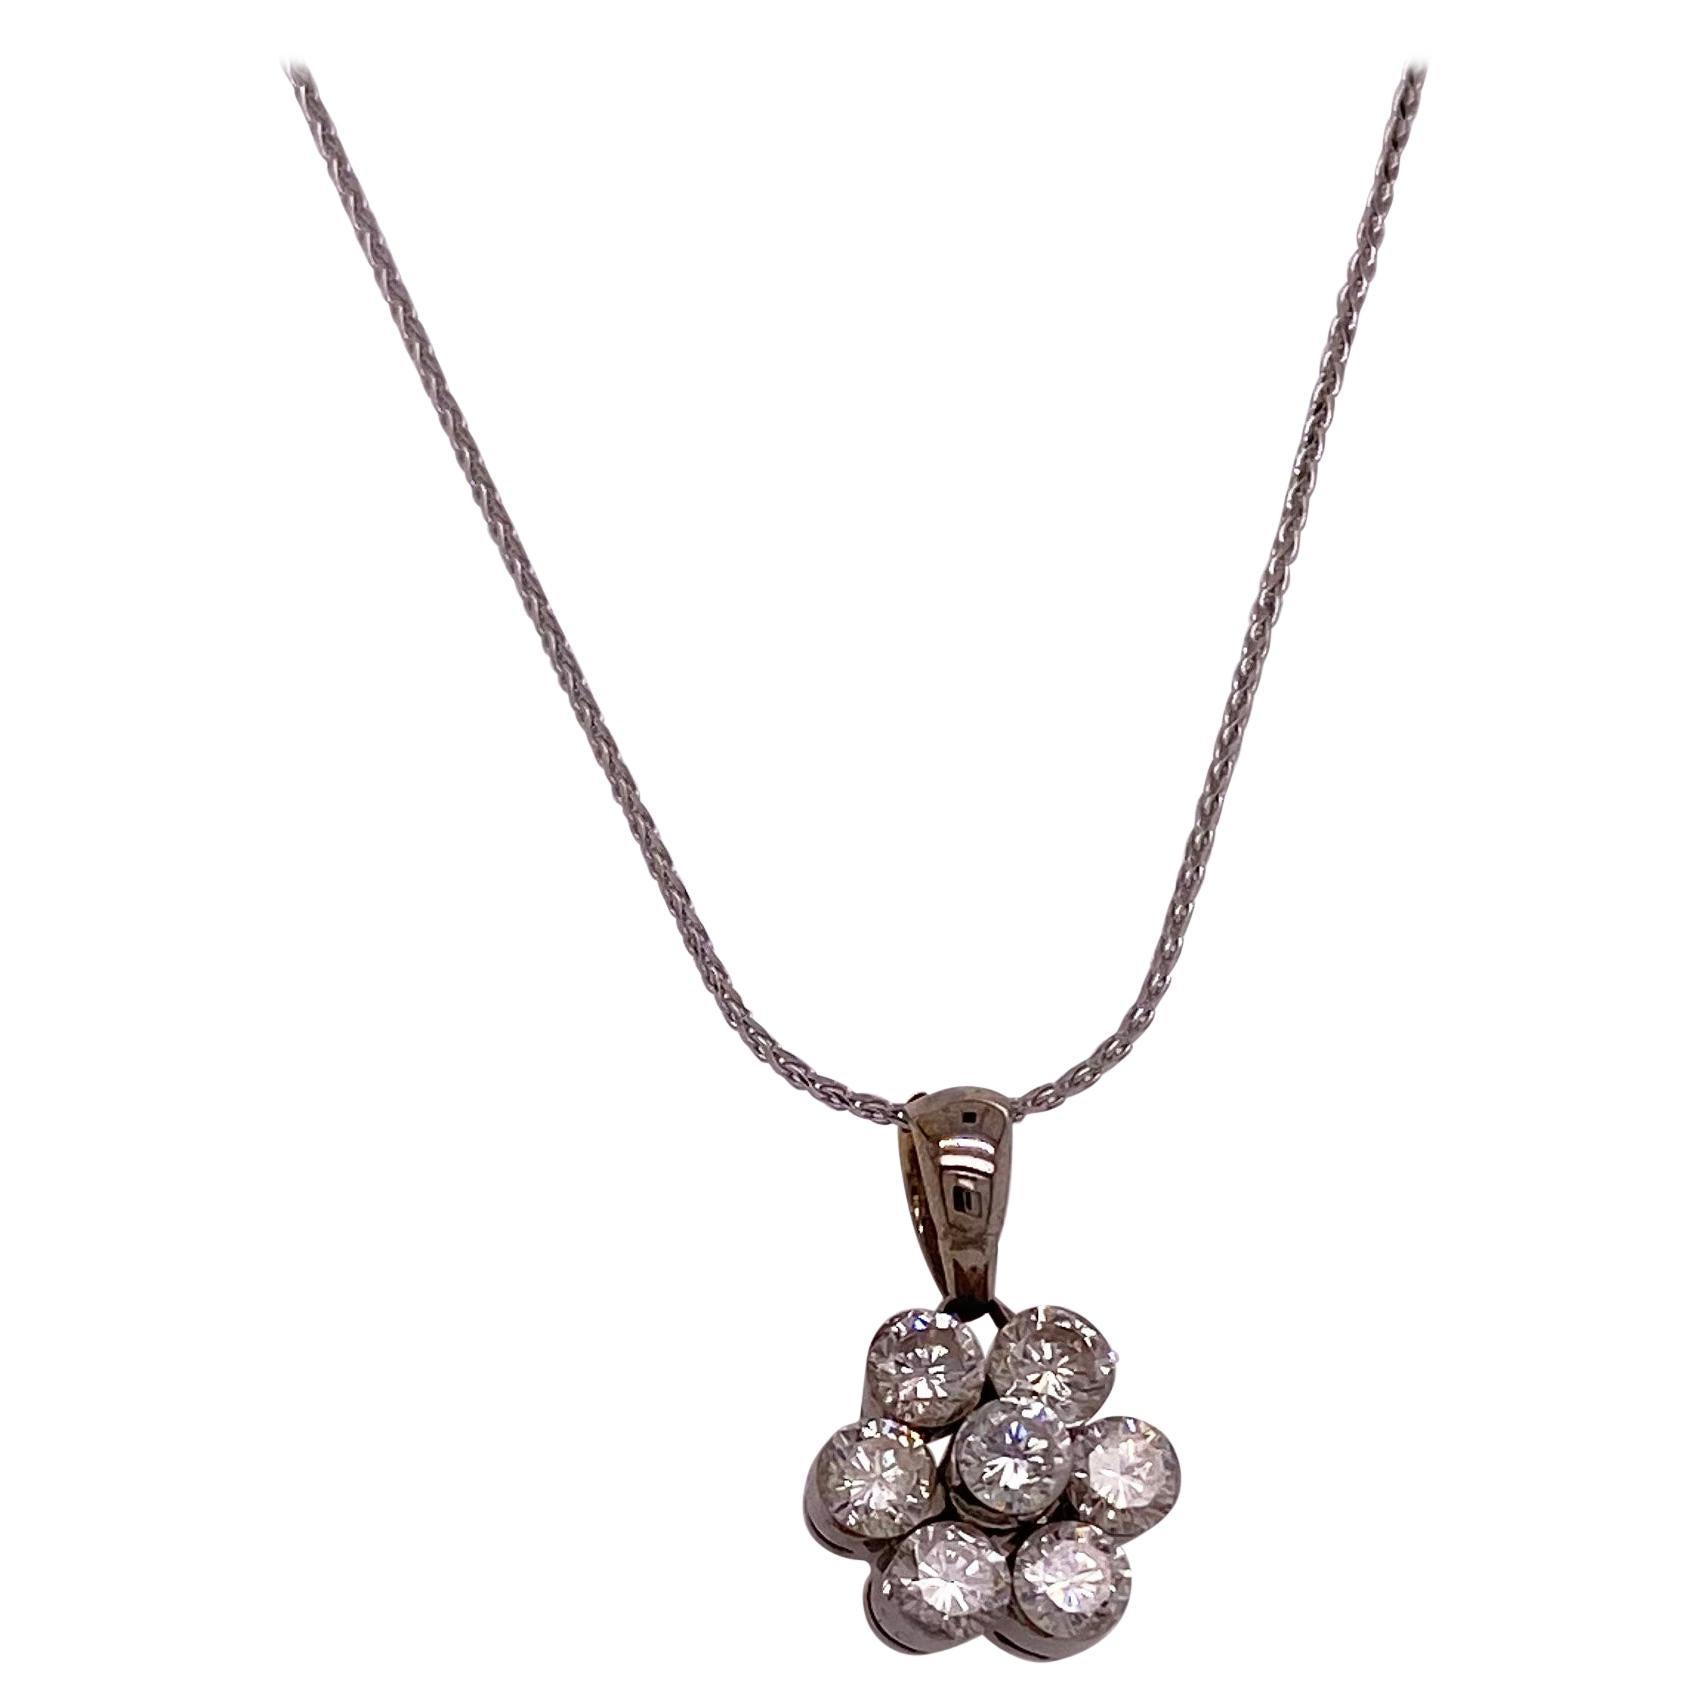 Diamond Flower Necklace w 7 Diamond Cluster Design in 14k White Gold